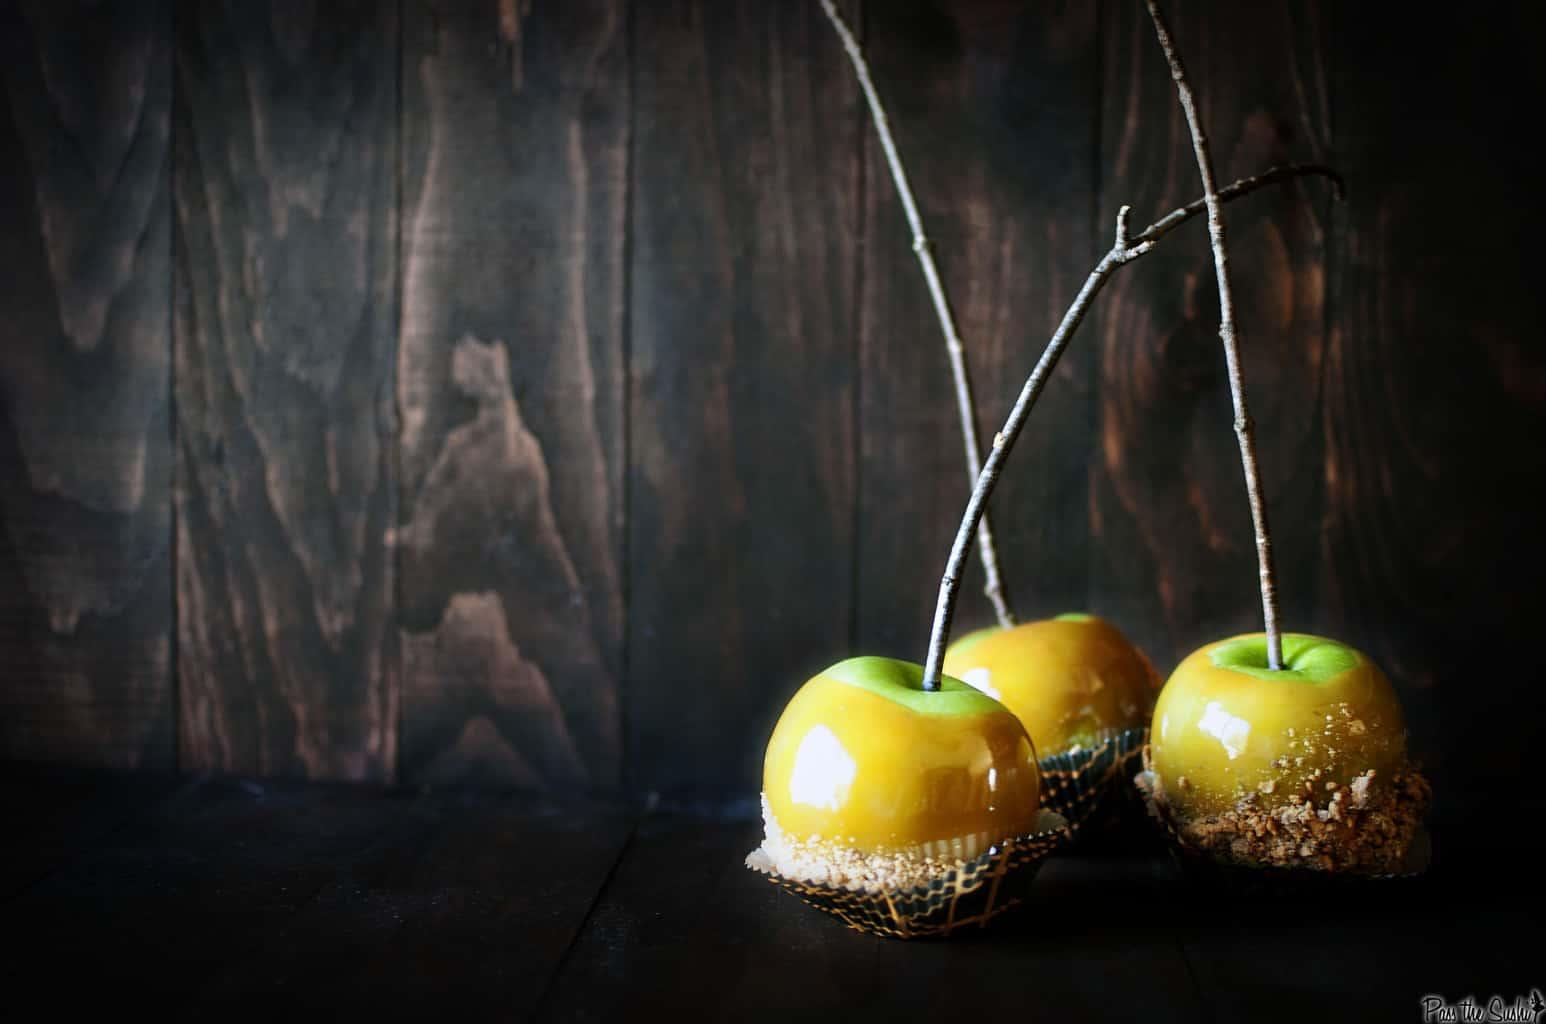 Butterfinger Caramel Apples & Fables Giveaway